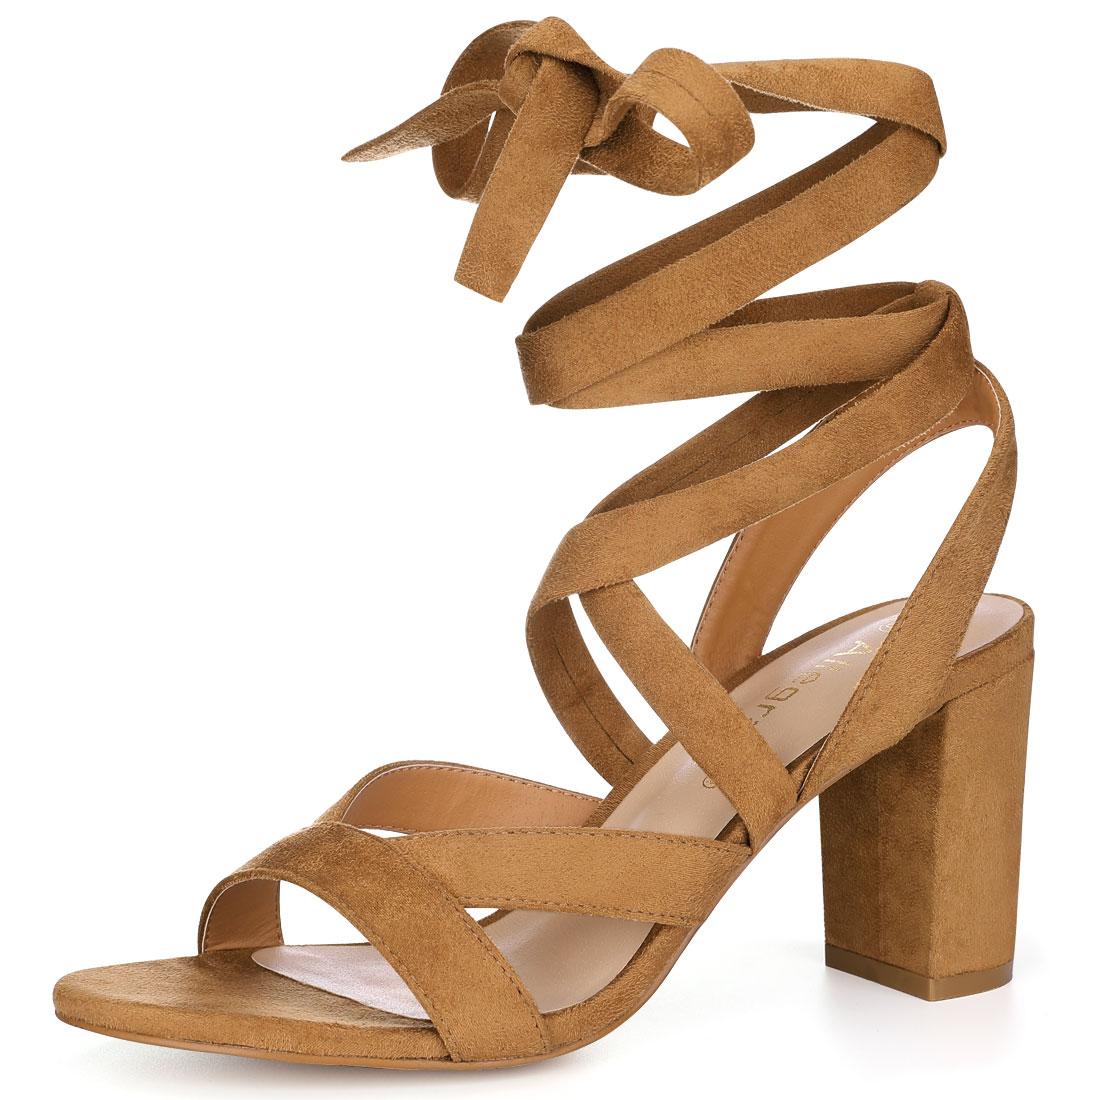 Allegra K Women Crisscross Lace Up Chunky Heel Sandals Brown US 9